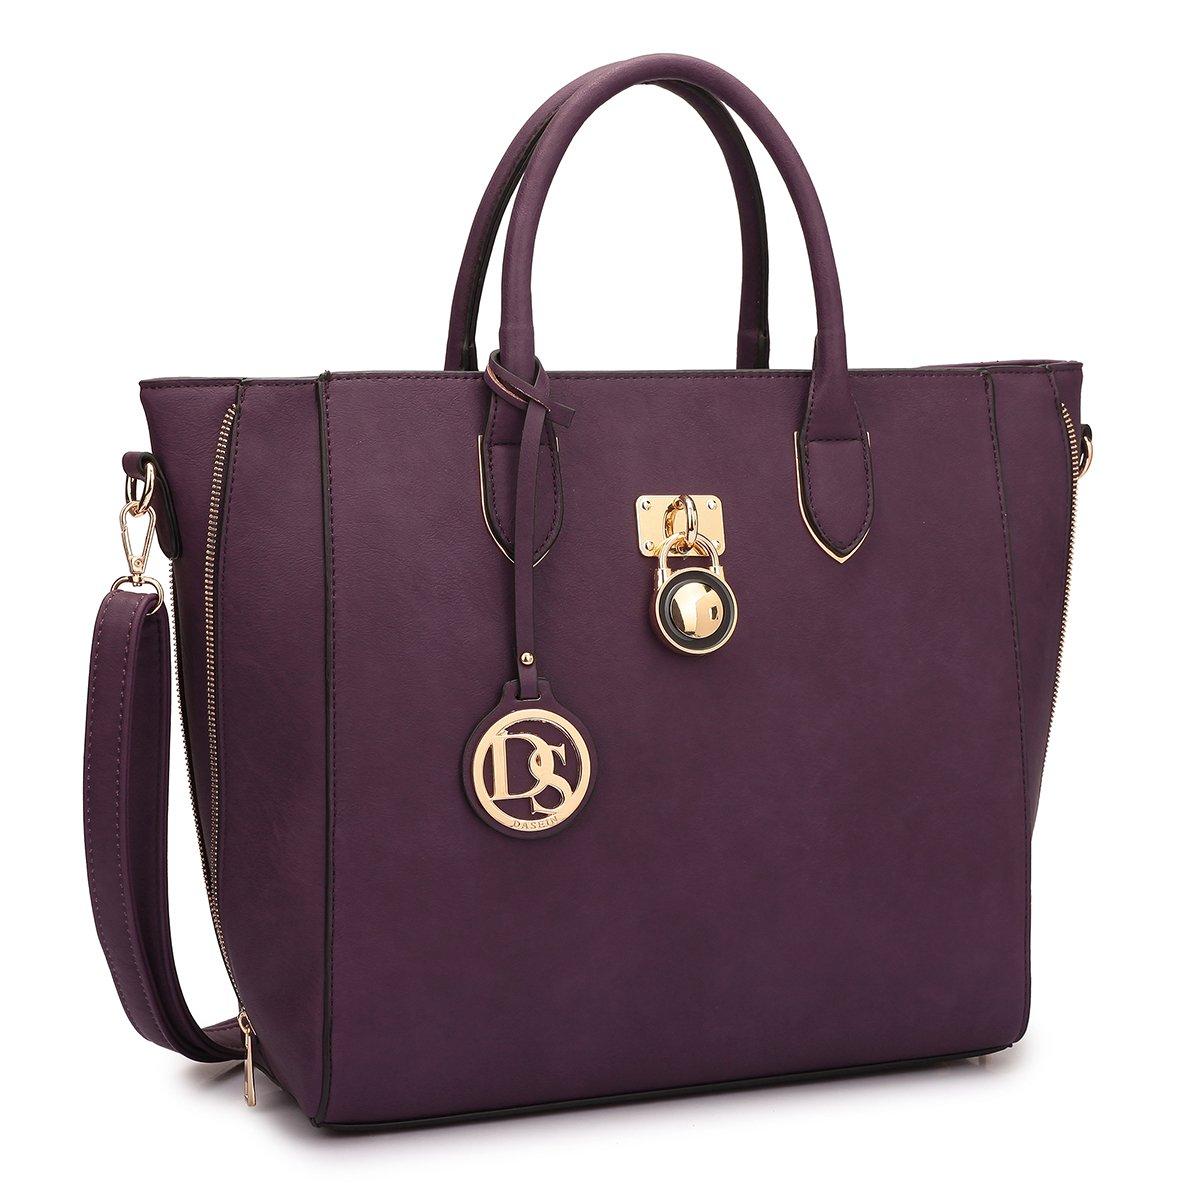 Dasein Women's Top Handle Structured Padlock Tote Bag Satchel Handbag Shoulder Bag With Shoulder Strap (Purple)